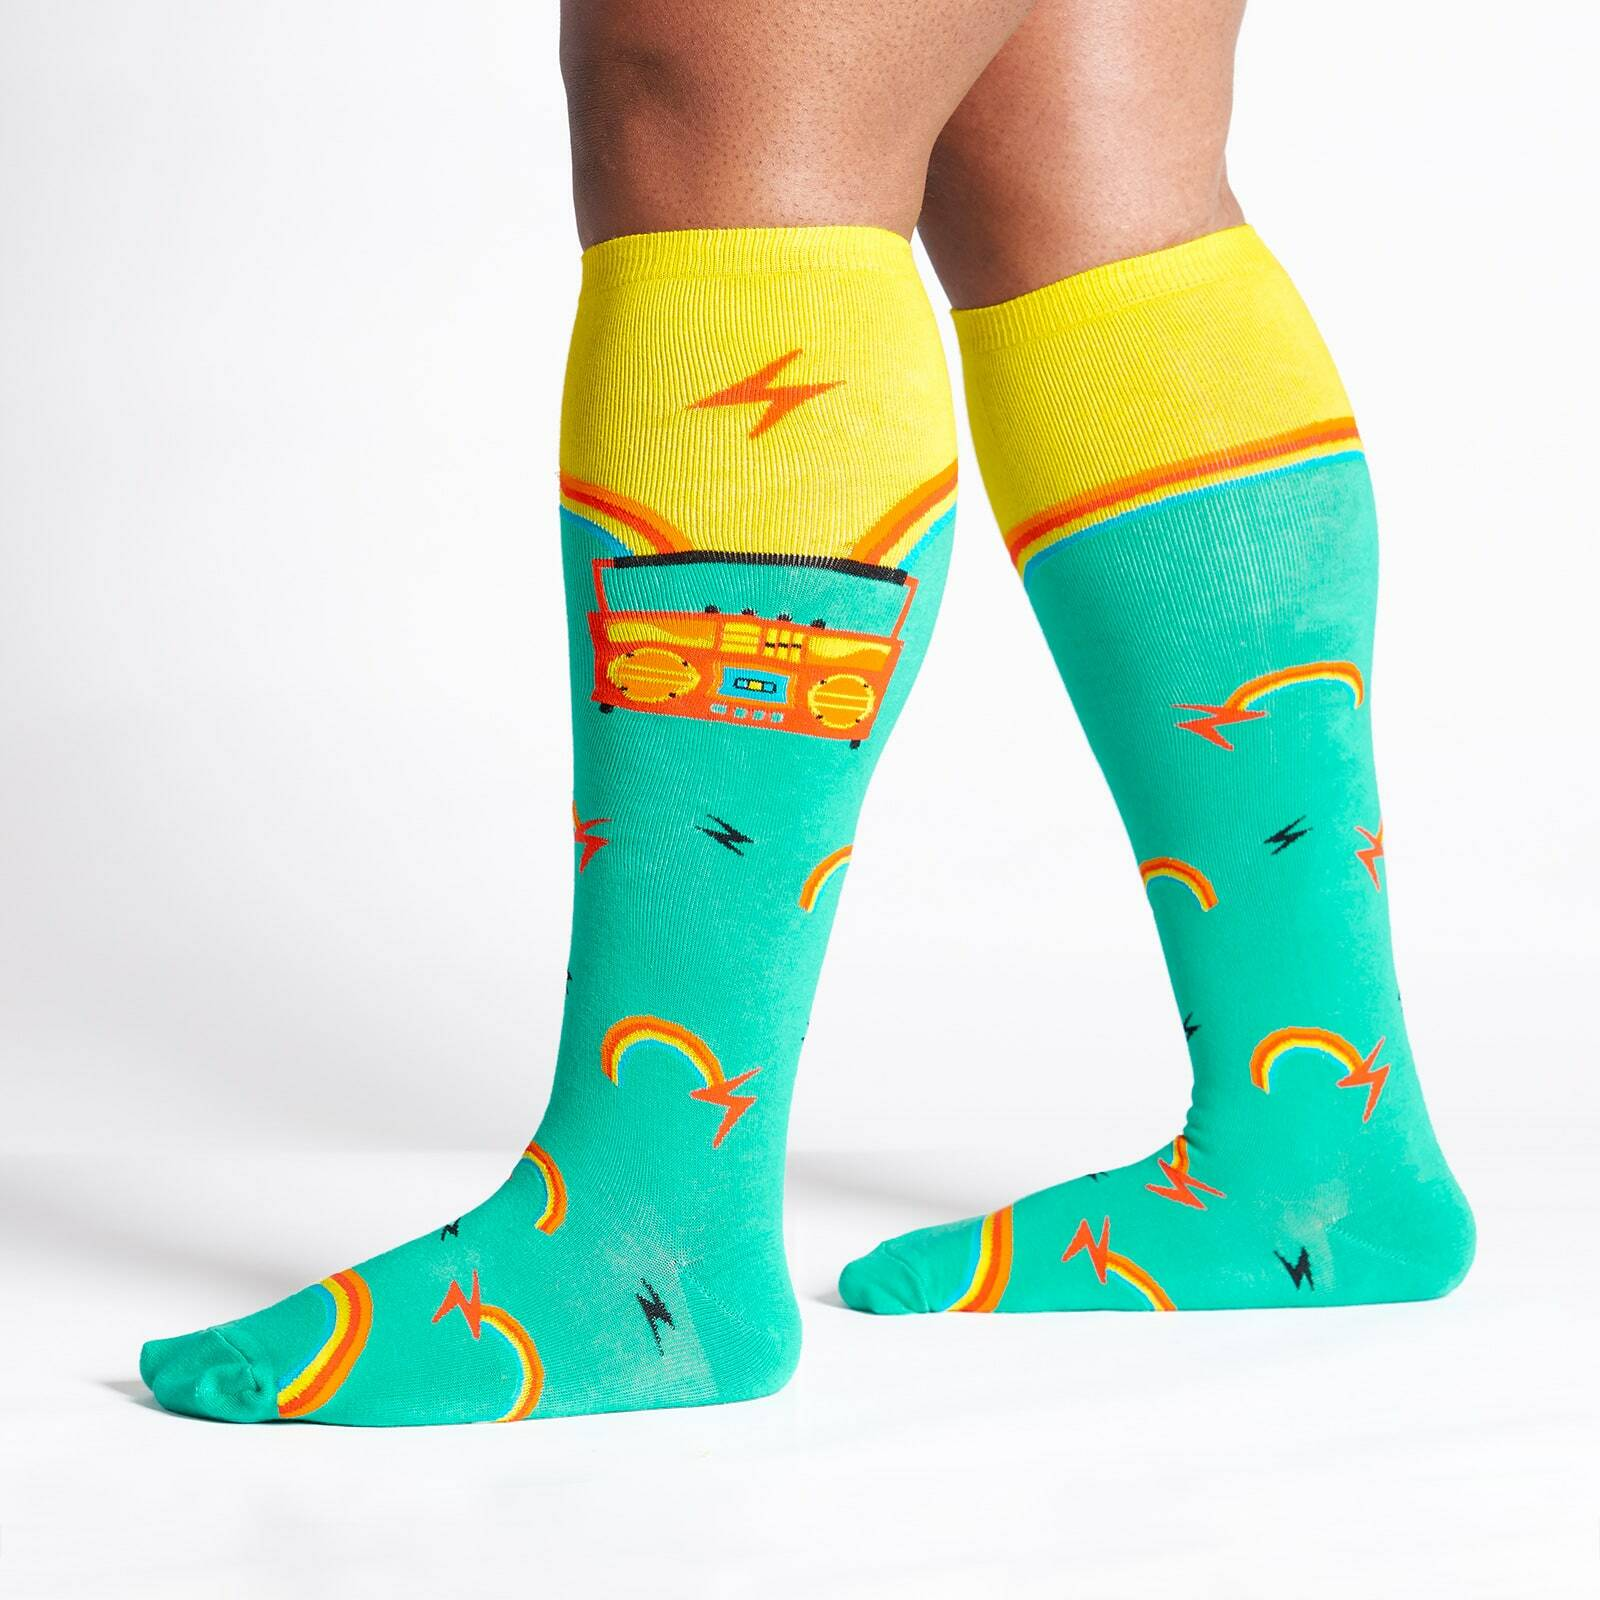 model wearing Roller Disco - Wide Calf - Boombox Knee High Socks Yellow - Unisex